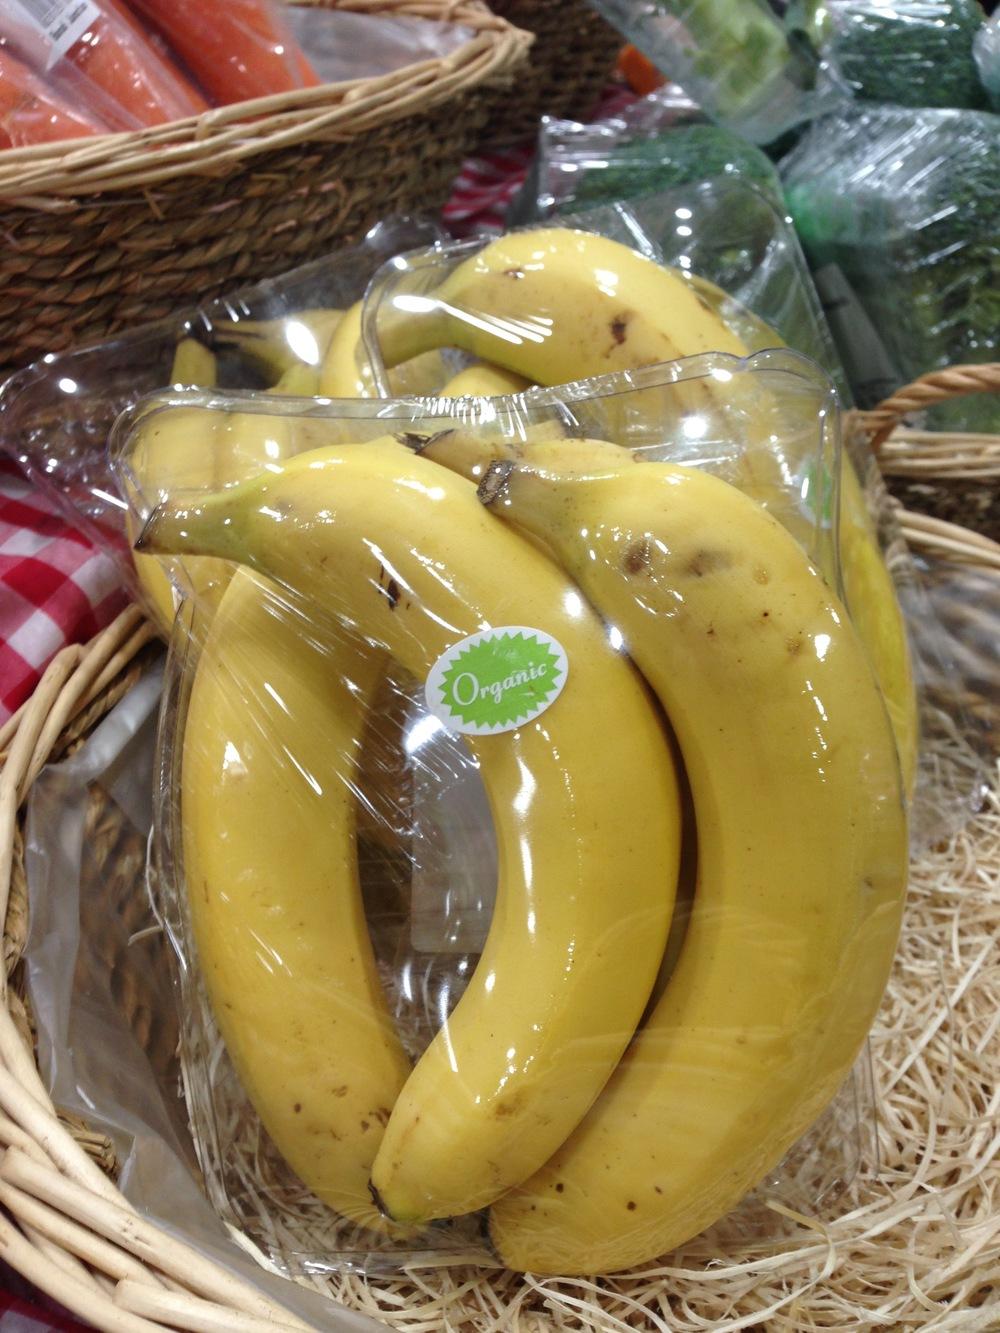 Bananas in plastic at Norton Street Grocer in Bondi Junction.